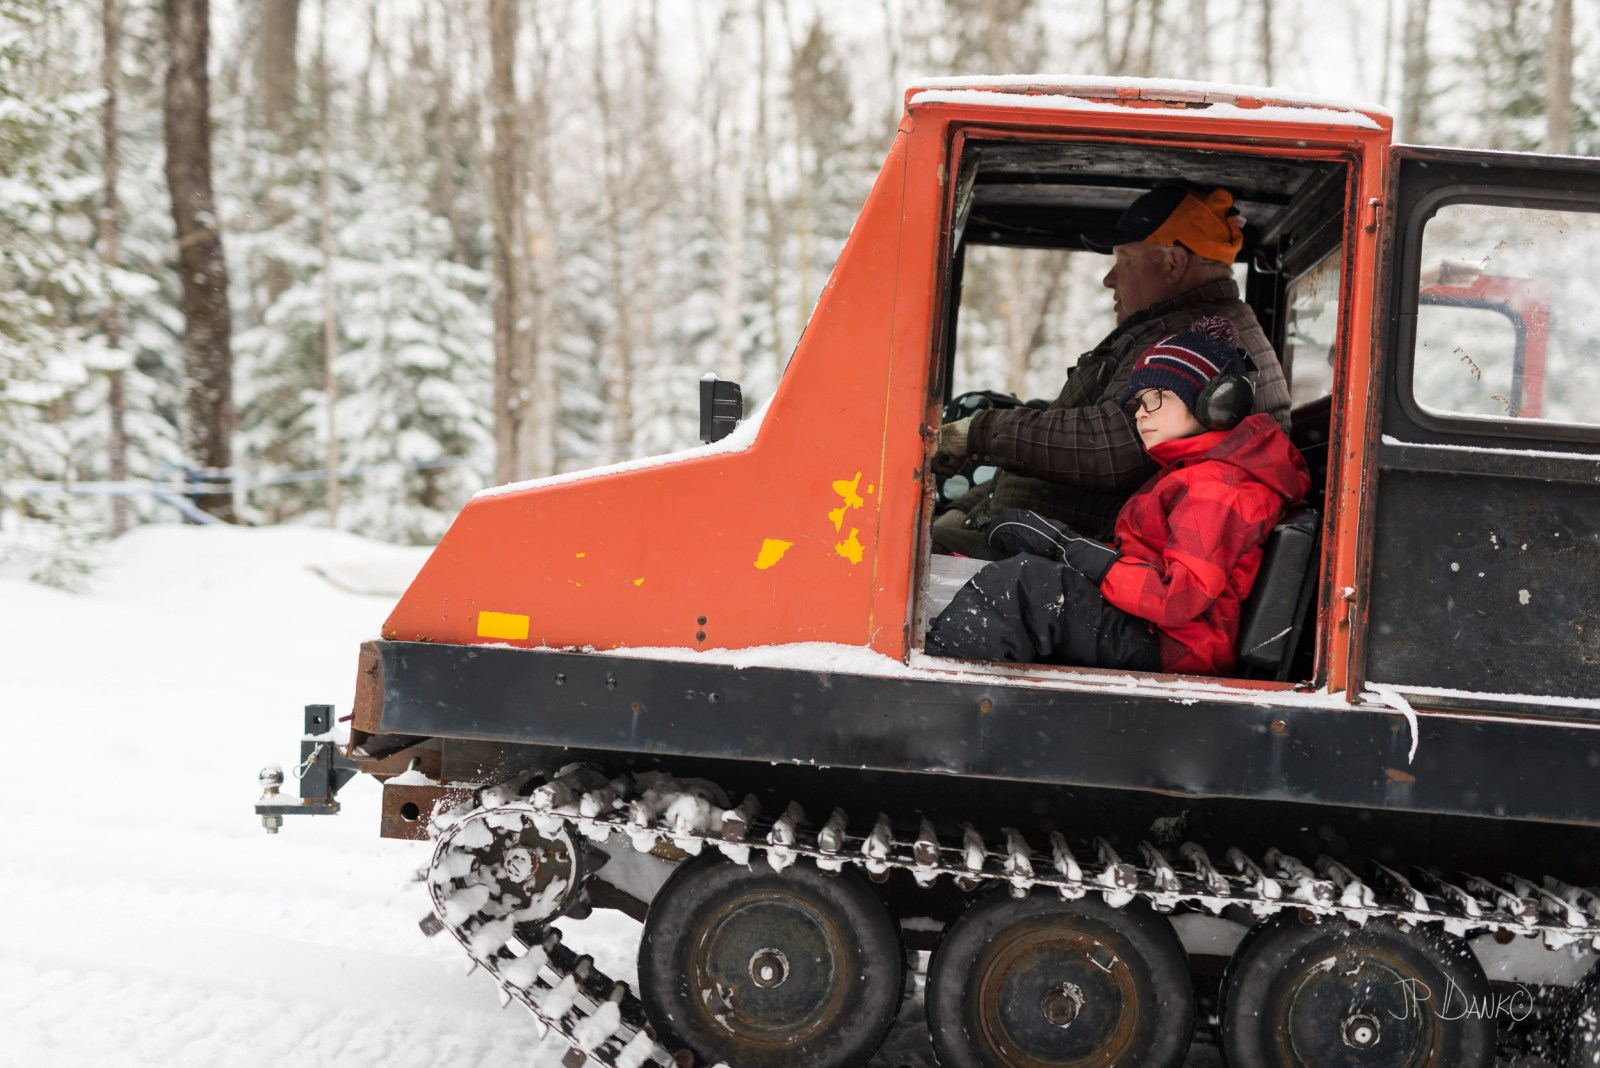 Boy calm in serene winter scene getting ride in old man's snow grooming machine